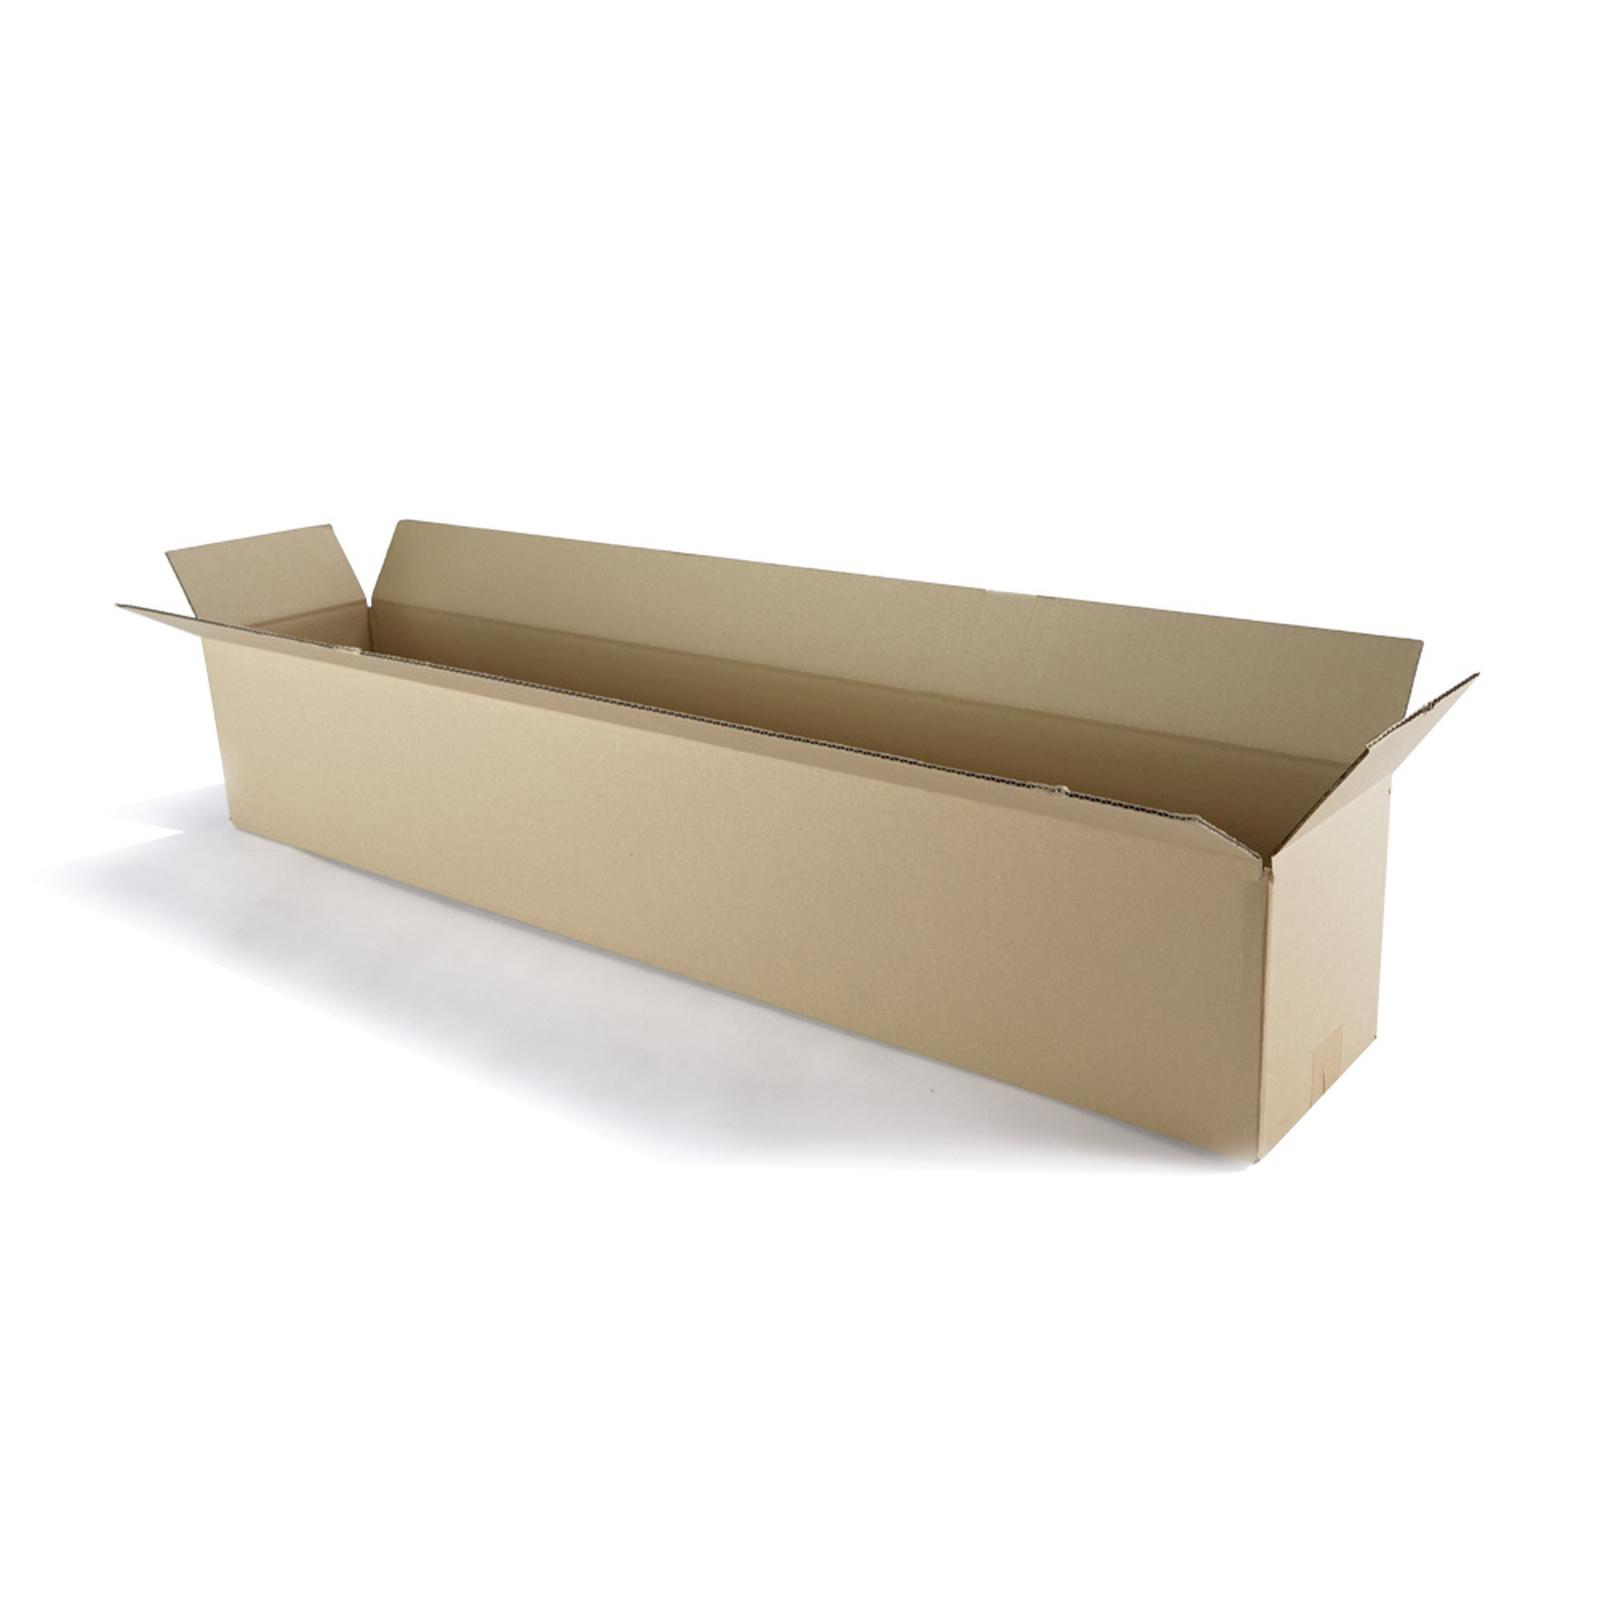 einwellige kartons 900x250x150 mm g nstig kaufen 0 71. Black Bedroom Furniture Sets. Home Design Ideas